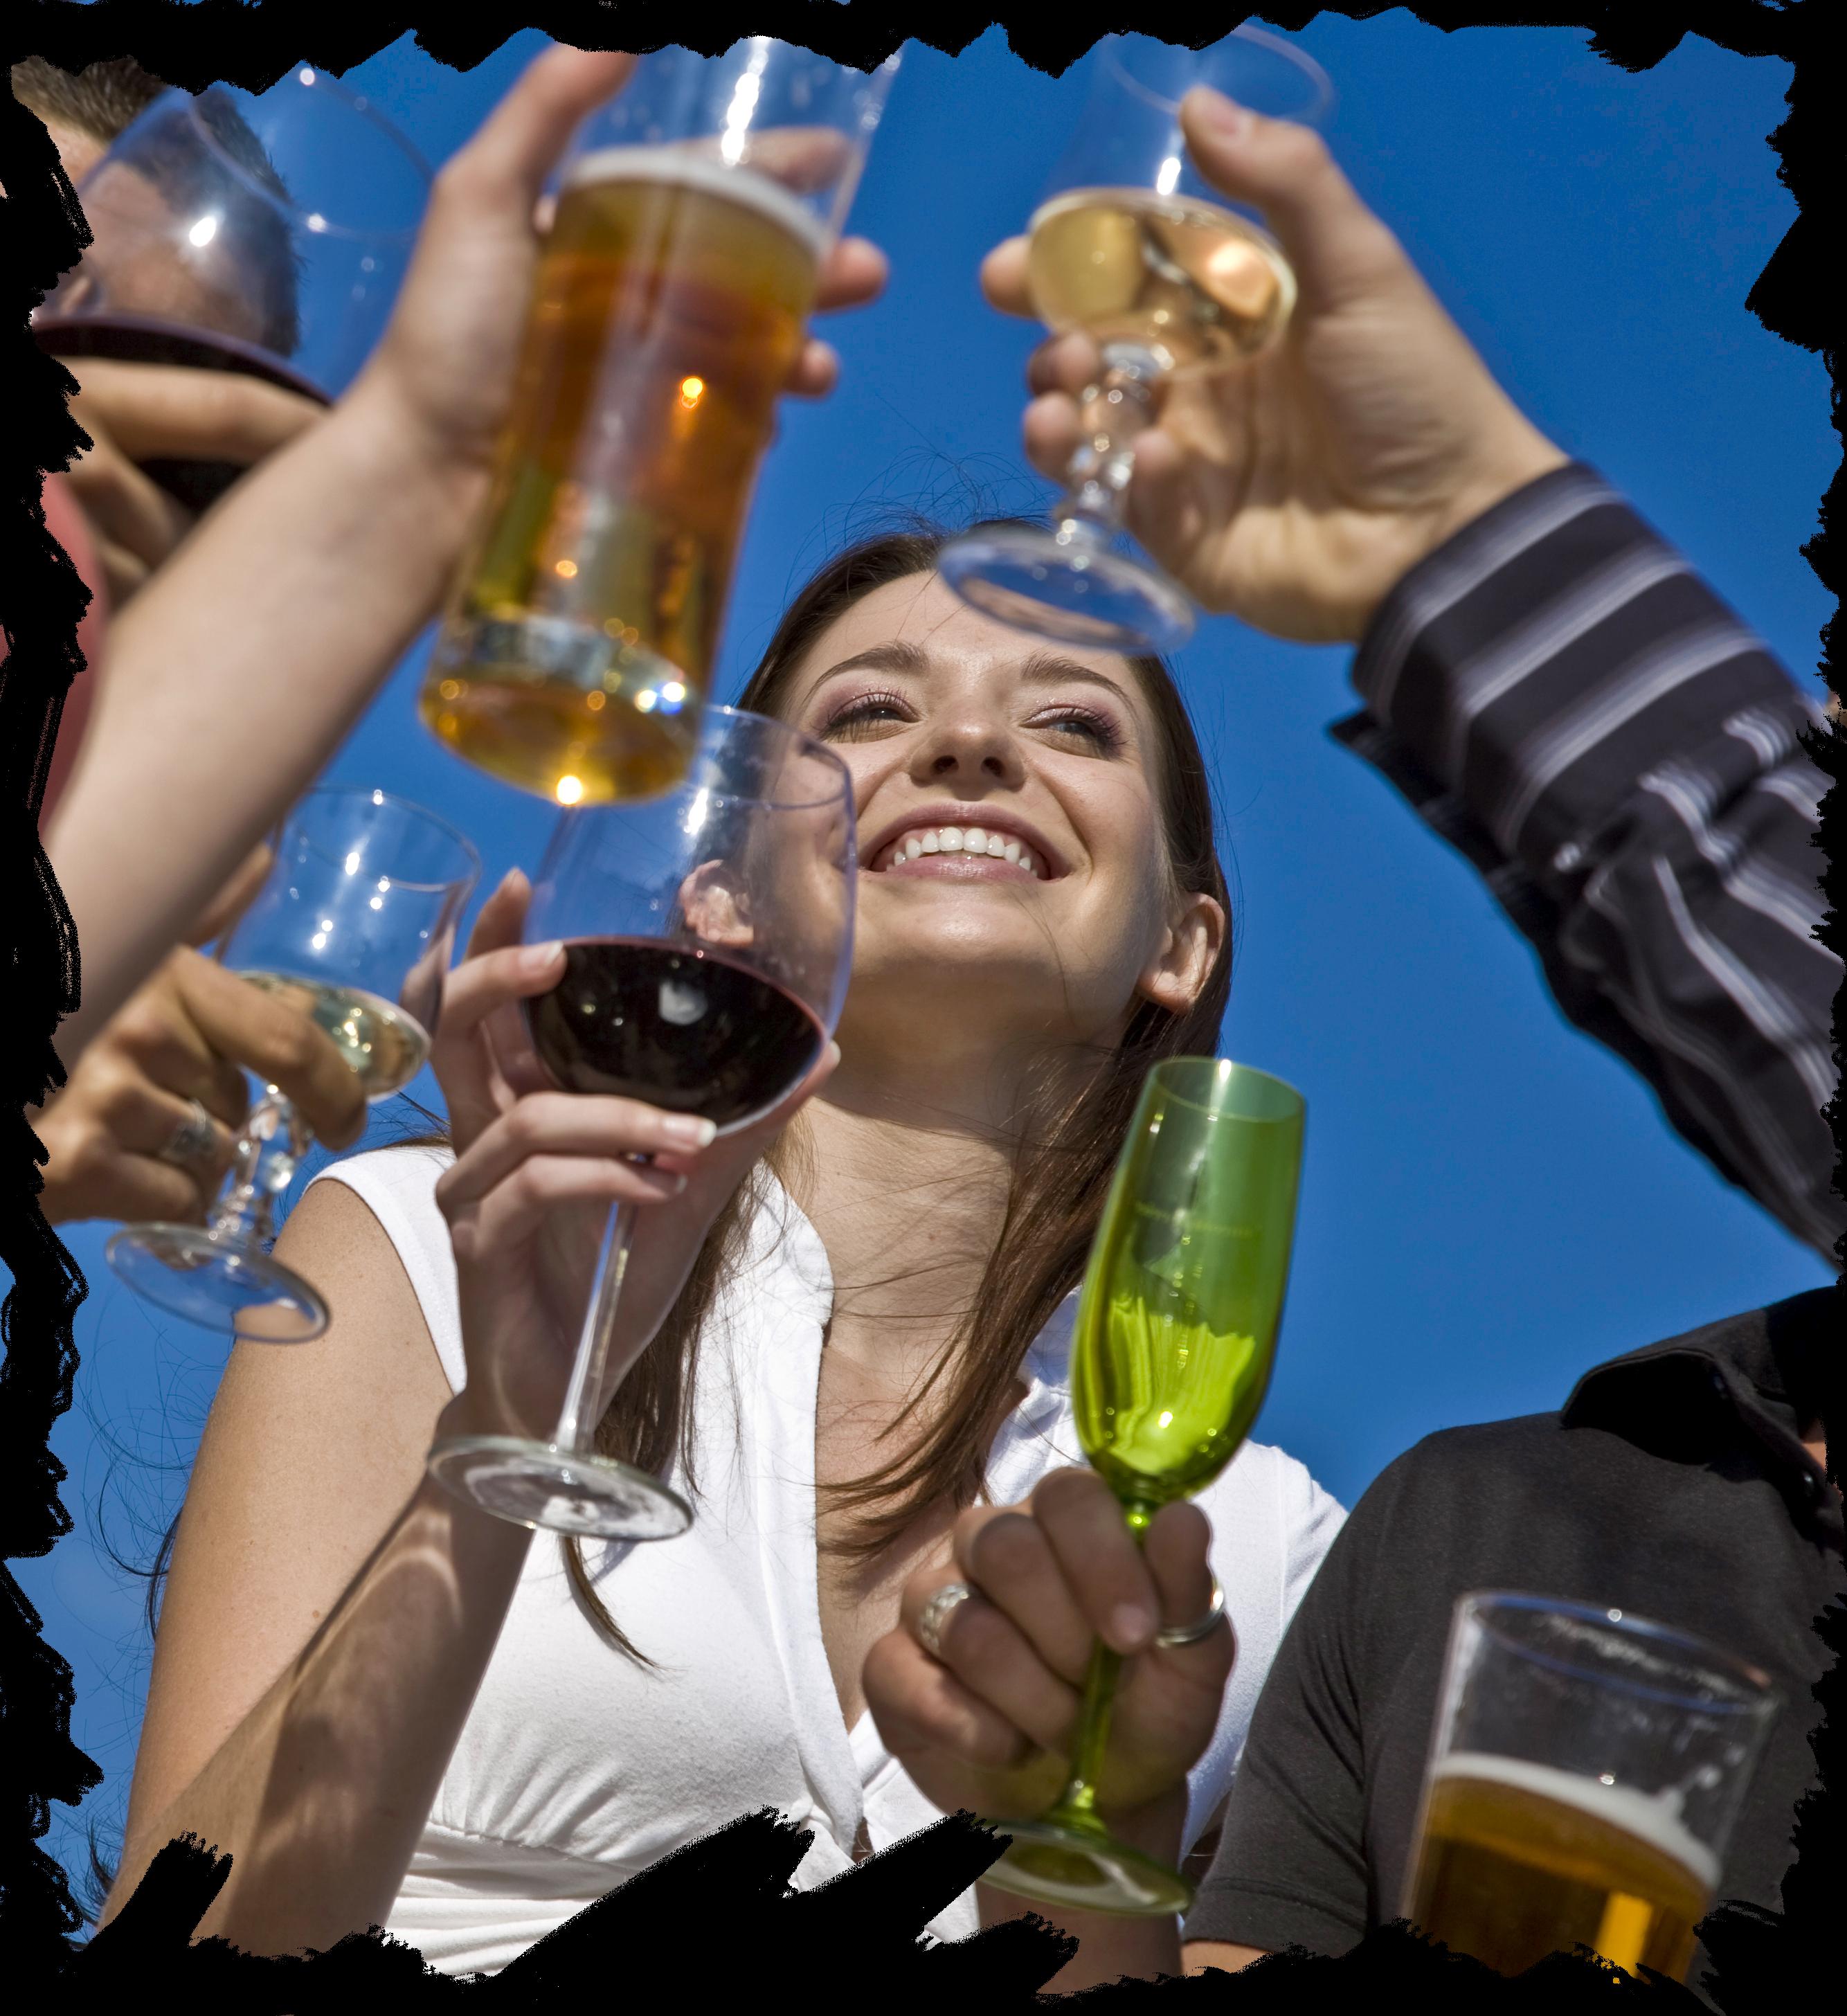 7 Days to Drink Less Program